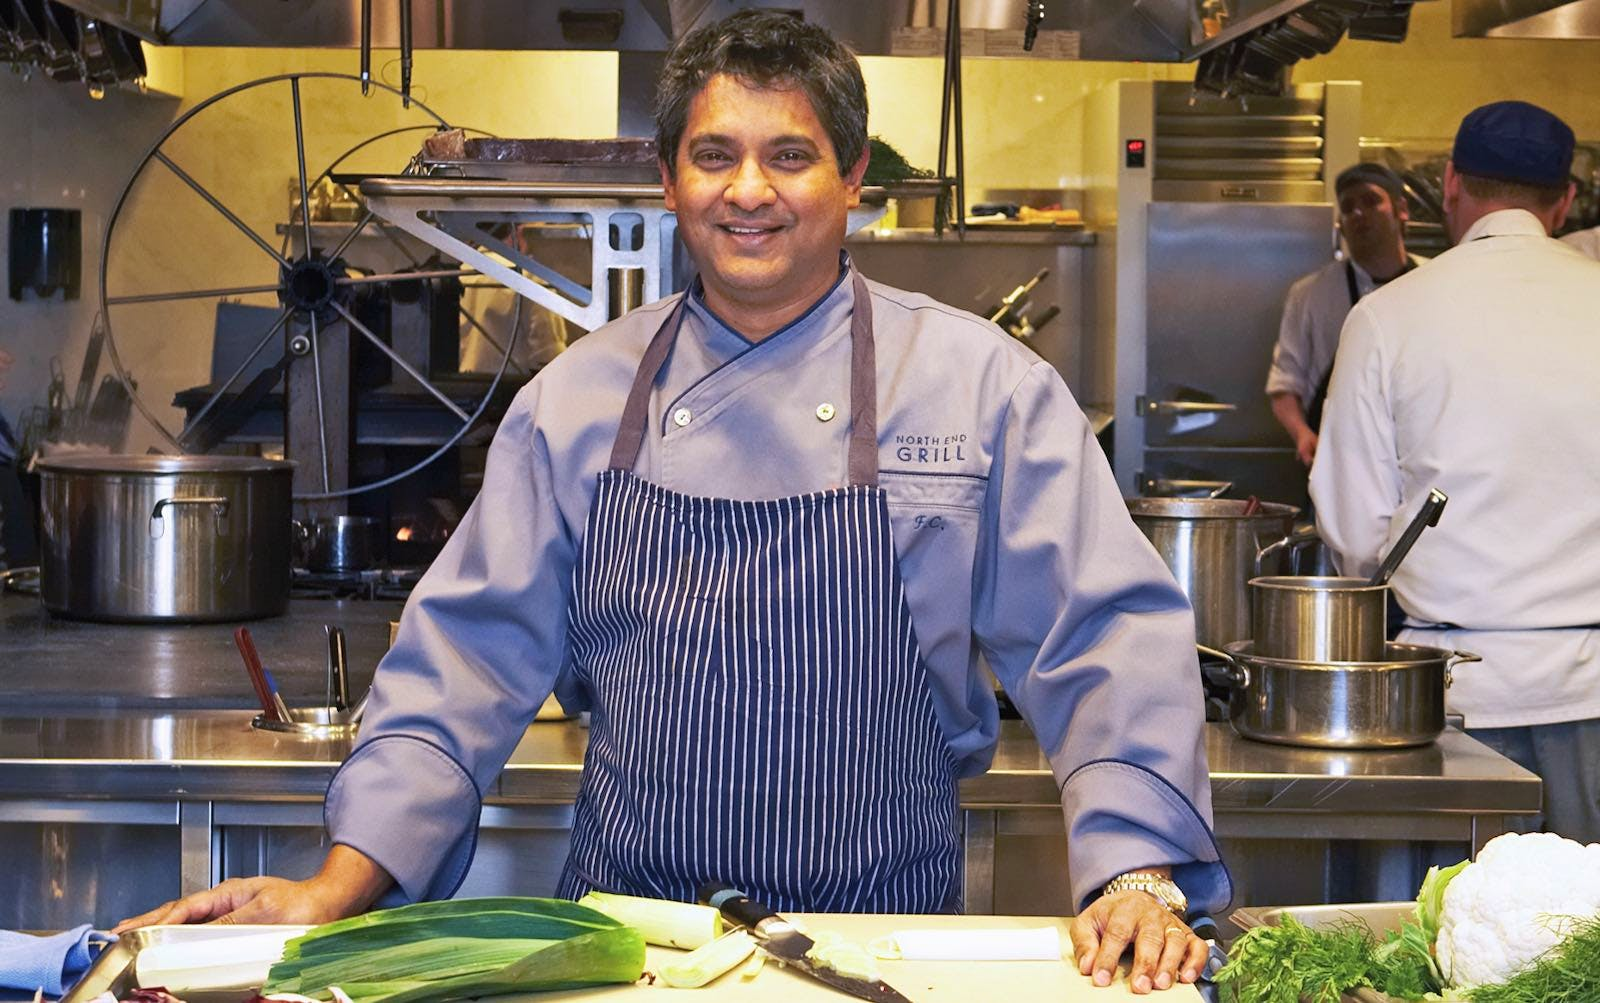 Chef Floyd Cardoz Dies After Contracting Coronavirus